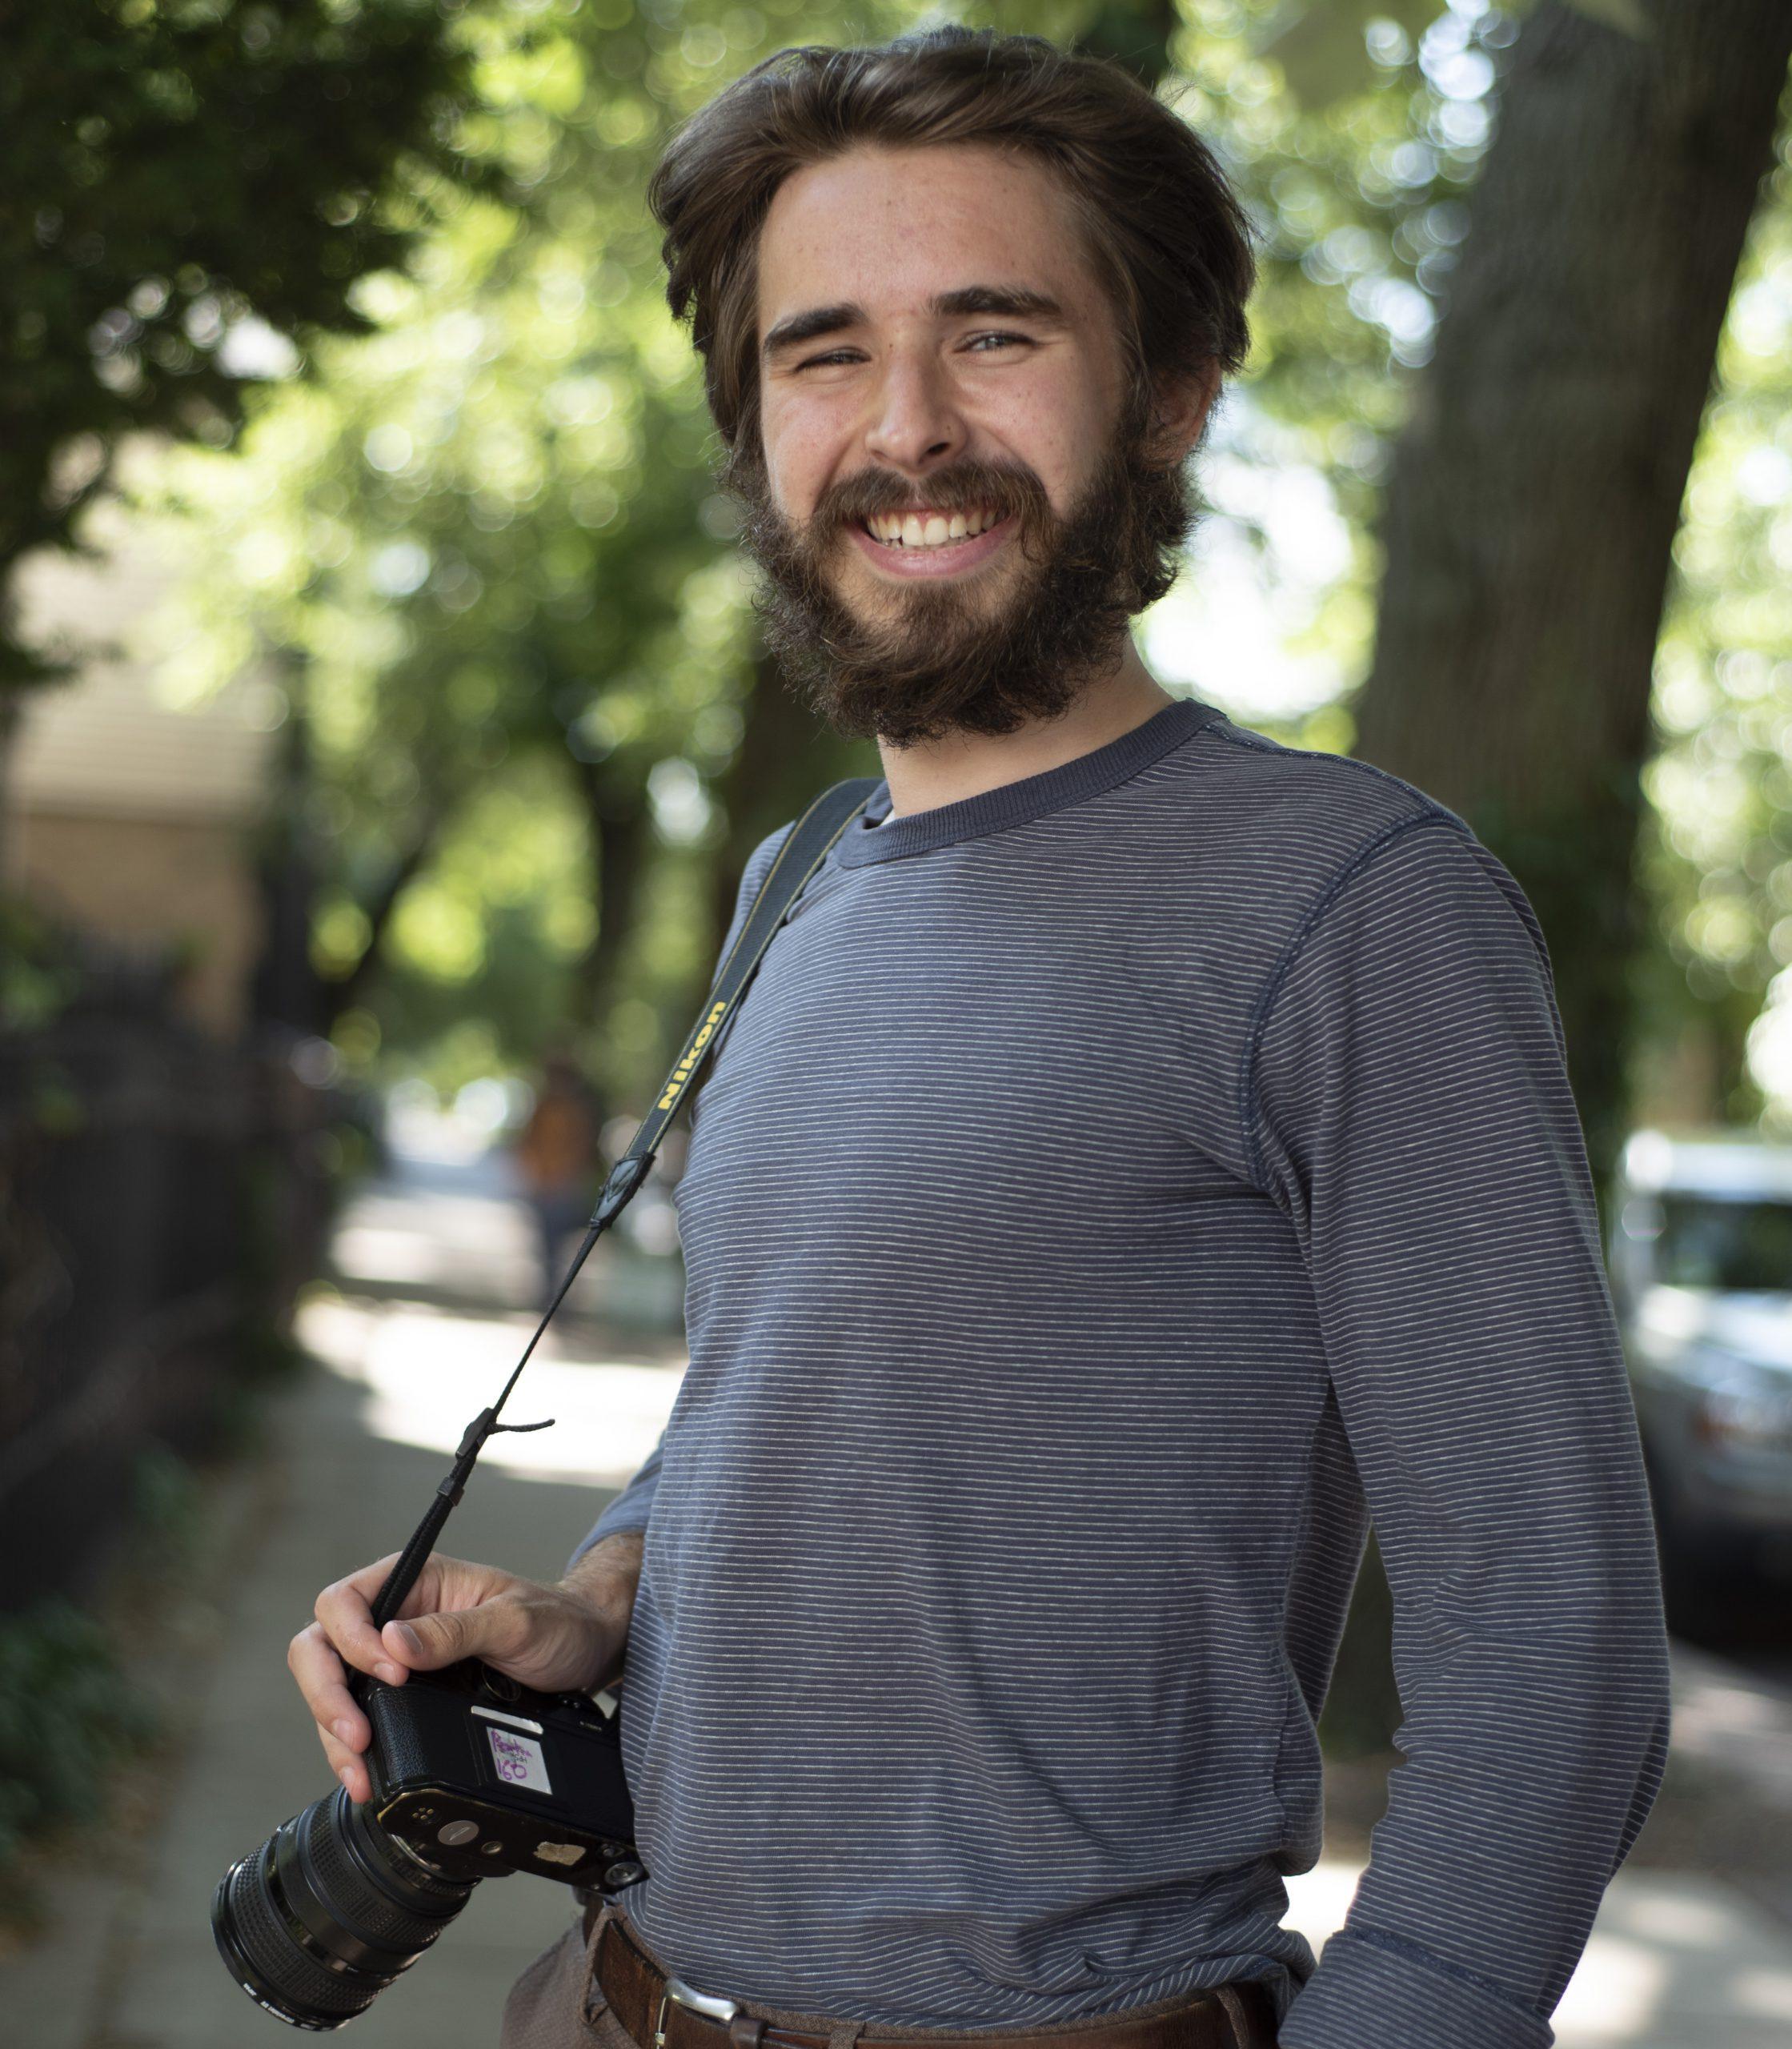 Colin Boyle holding camera.